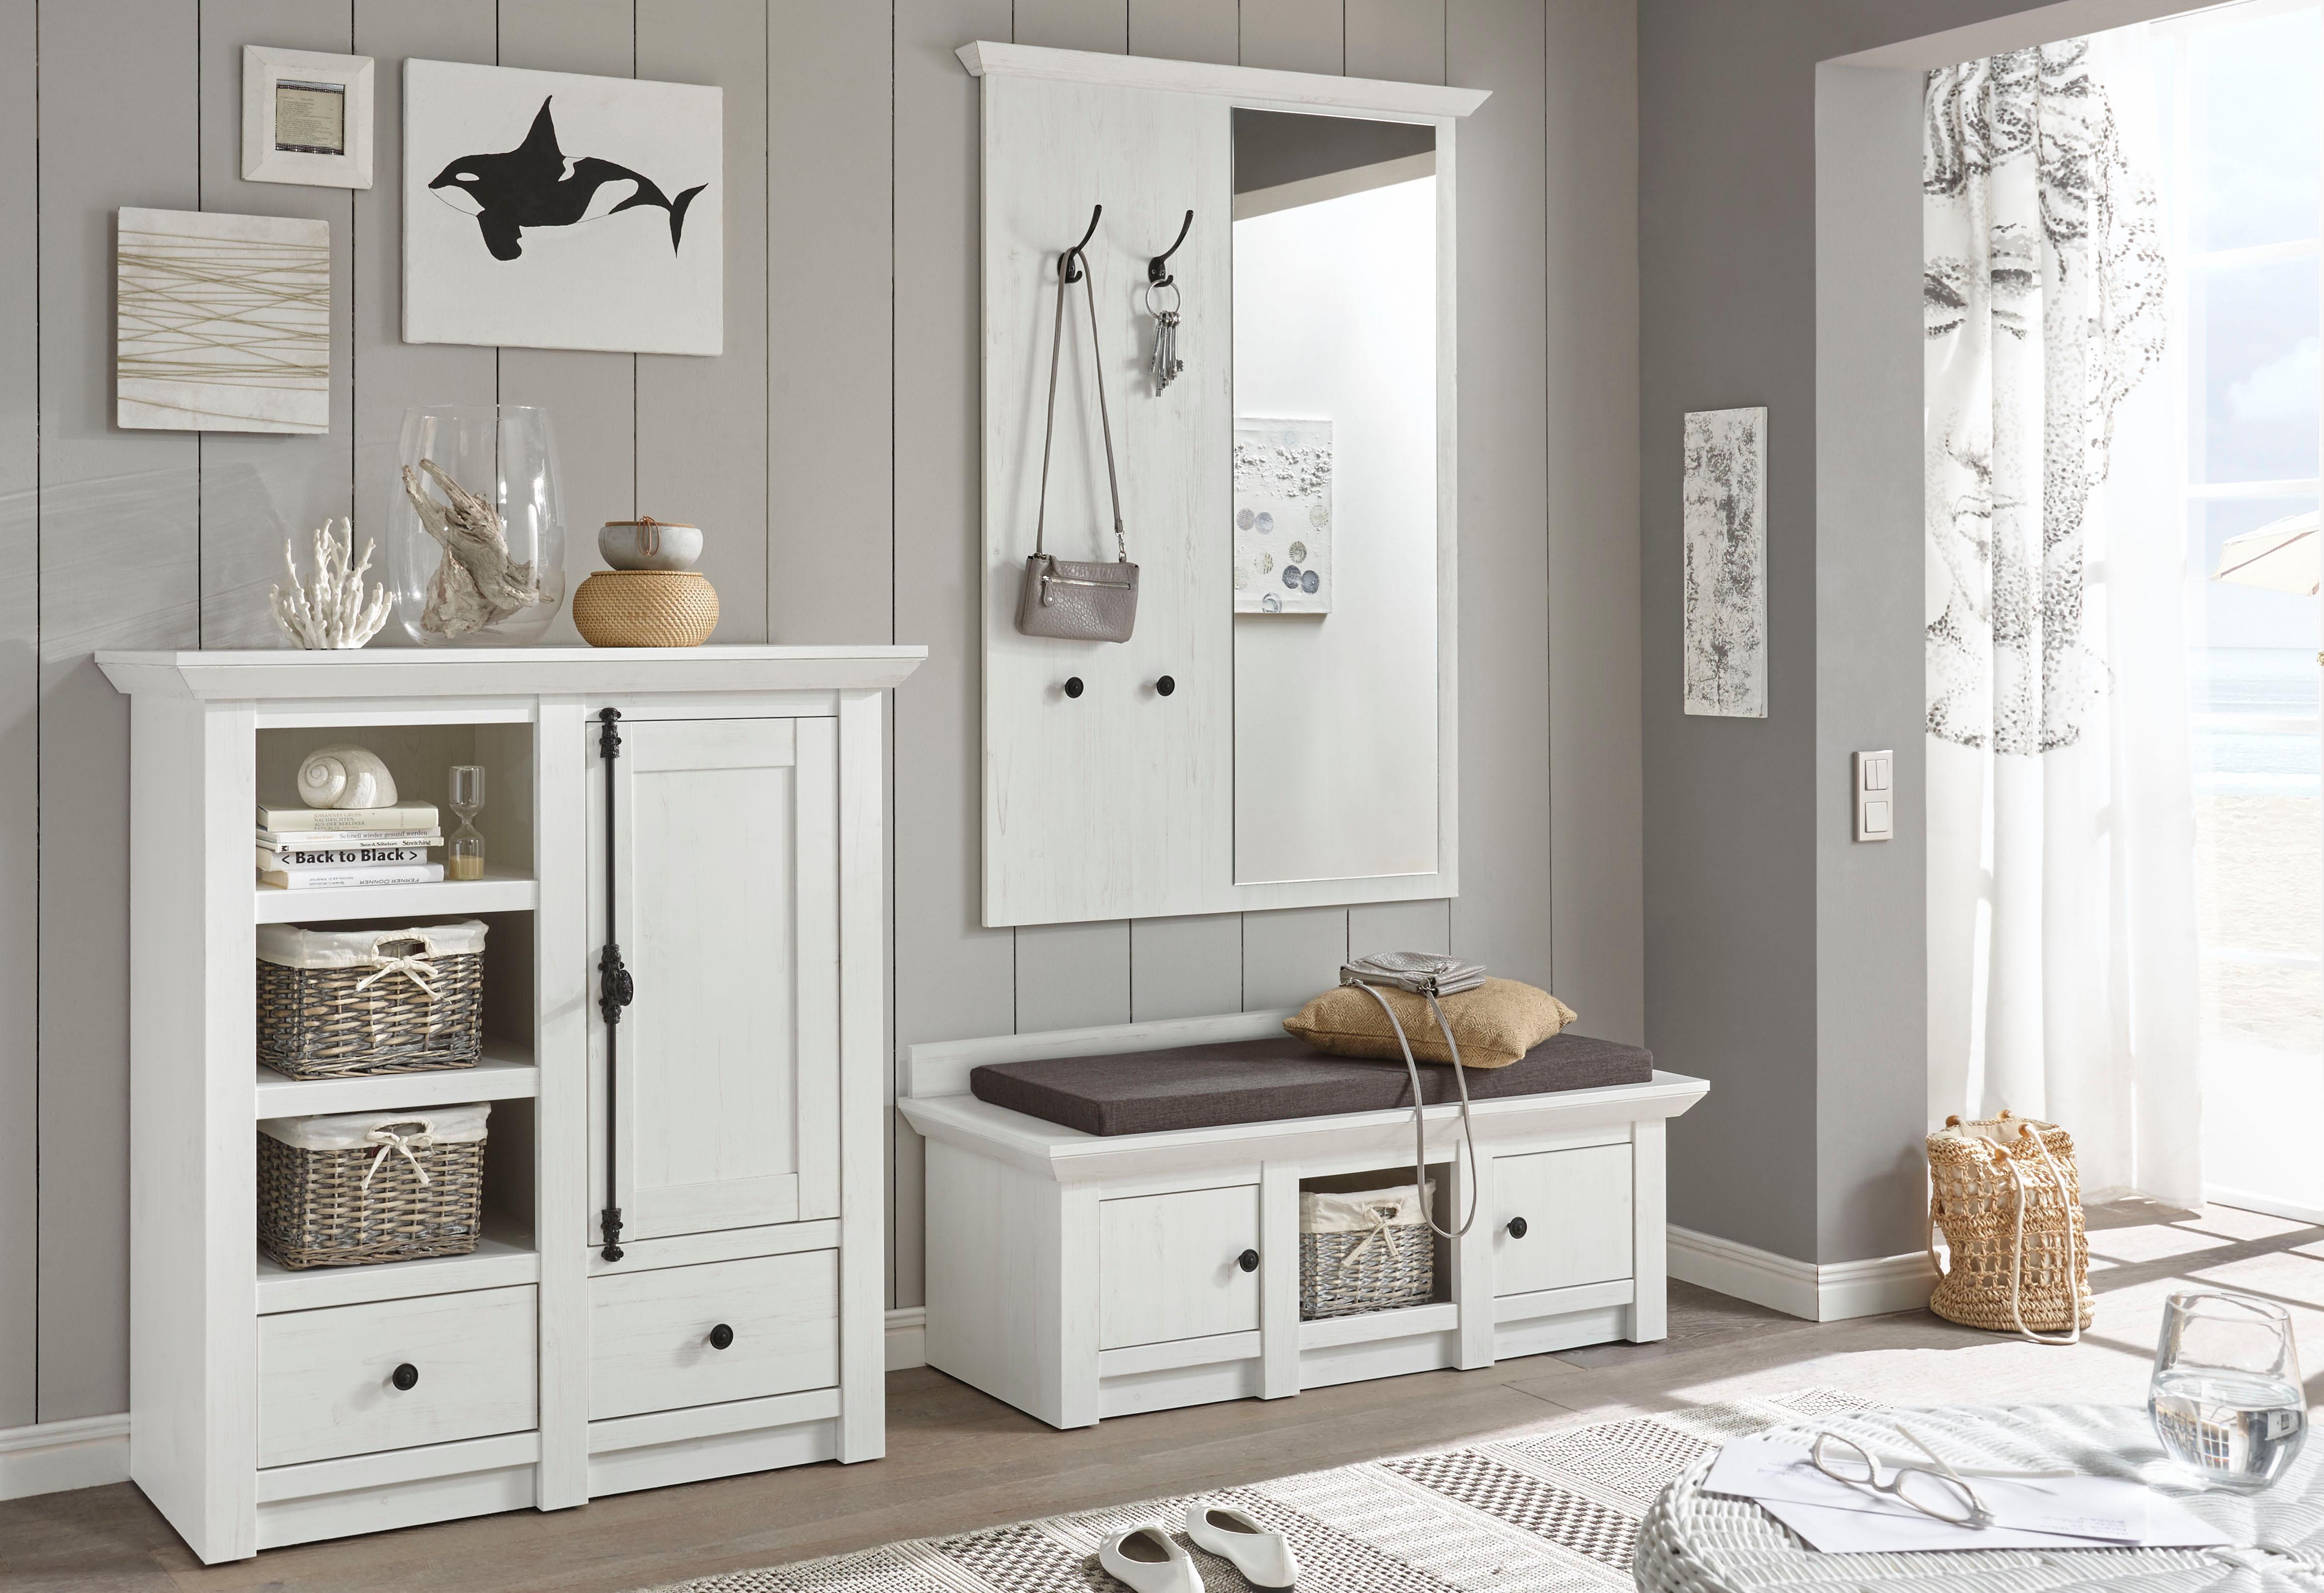 garderobe paneel preisvergleich die besten angebote. Black Bedroom Furniture Sets. Home Design Ideas